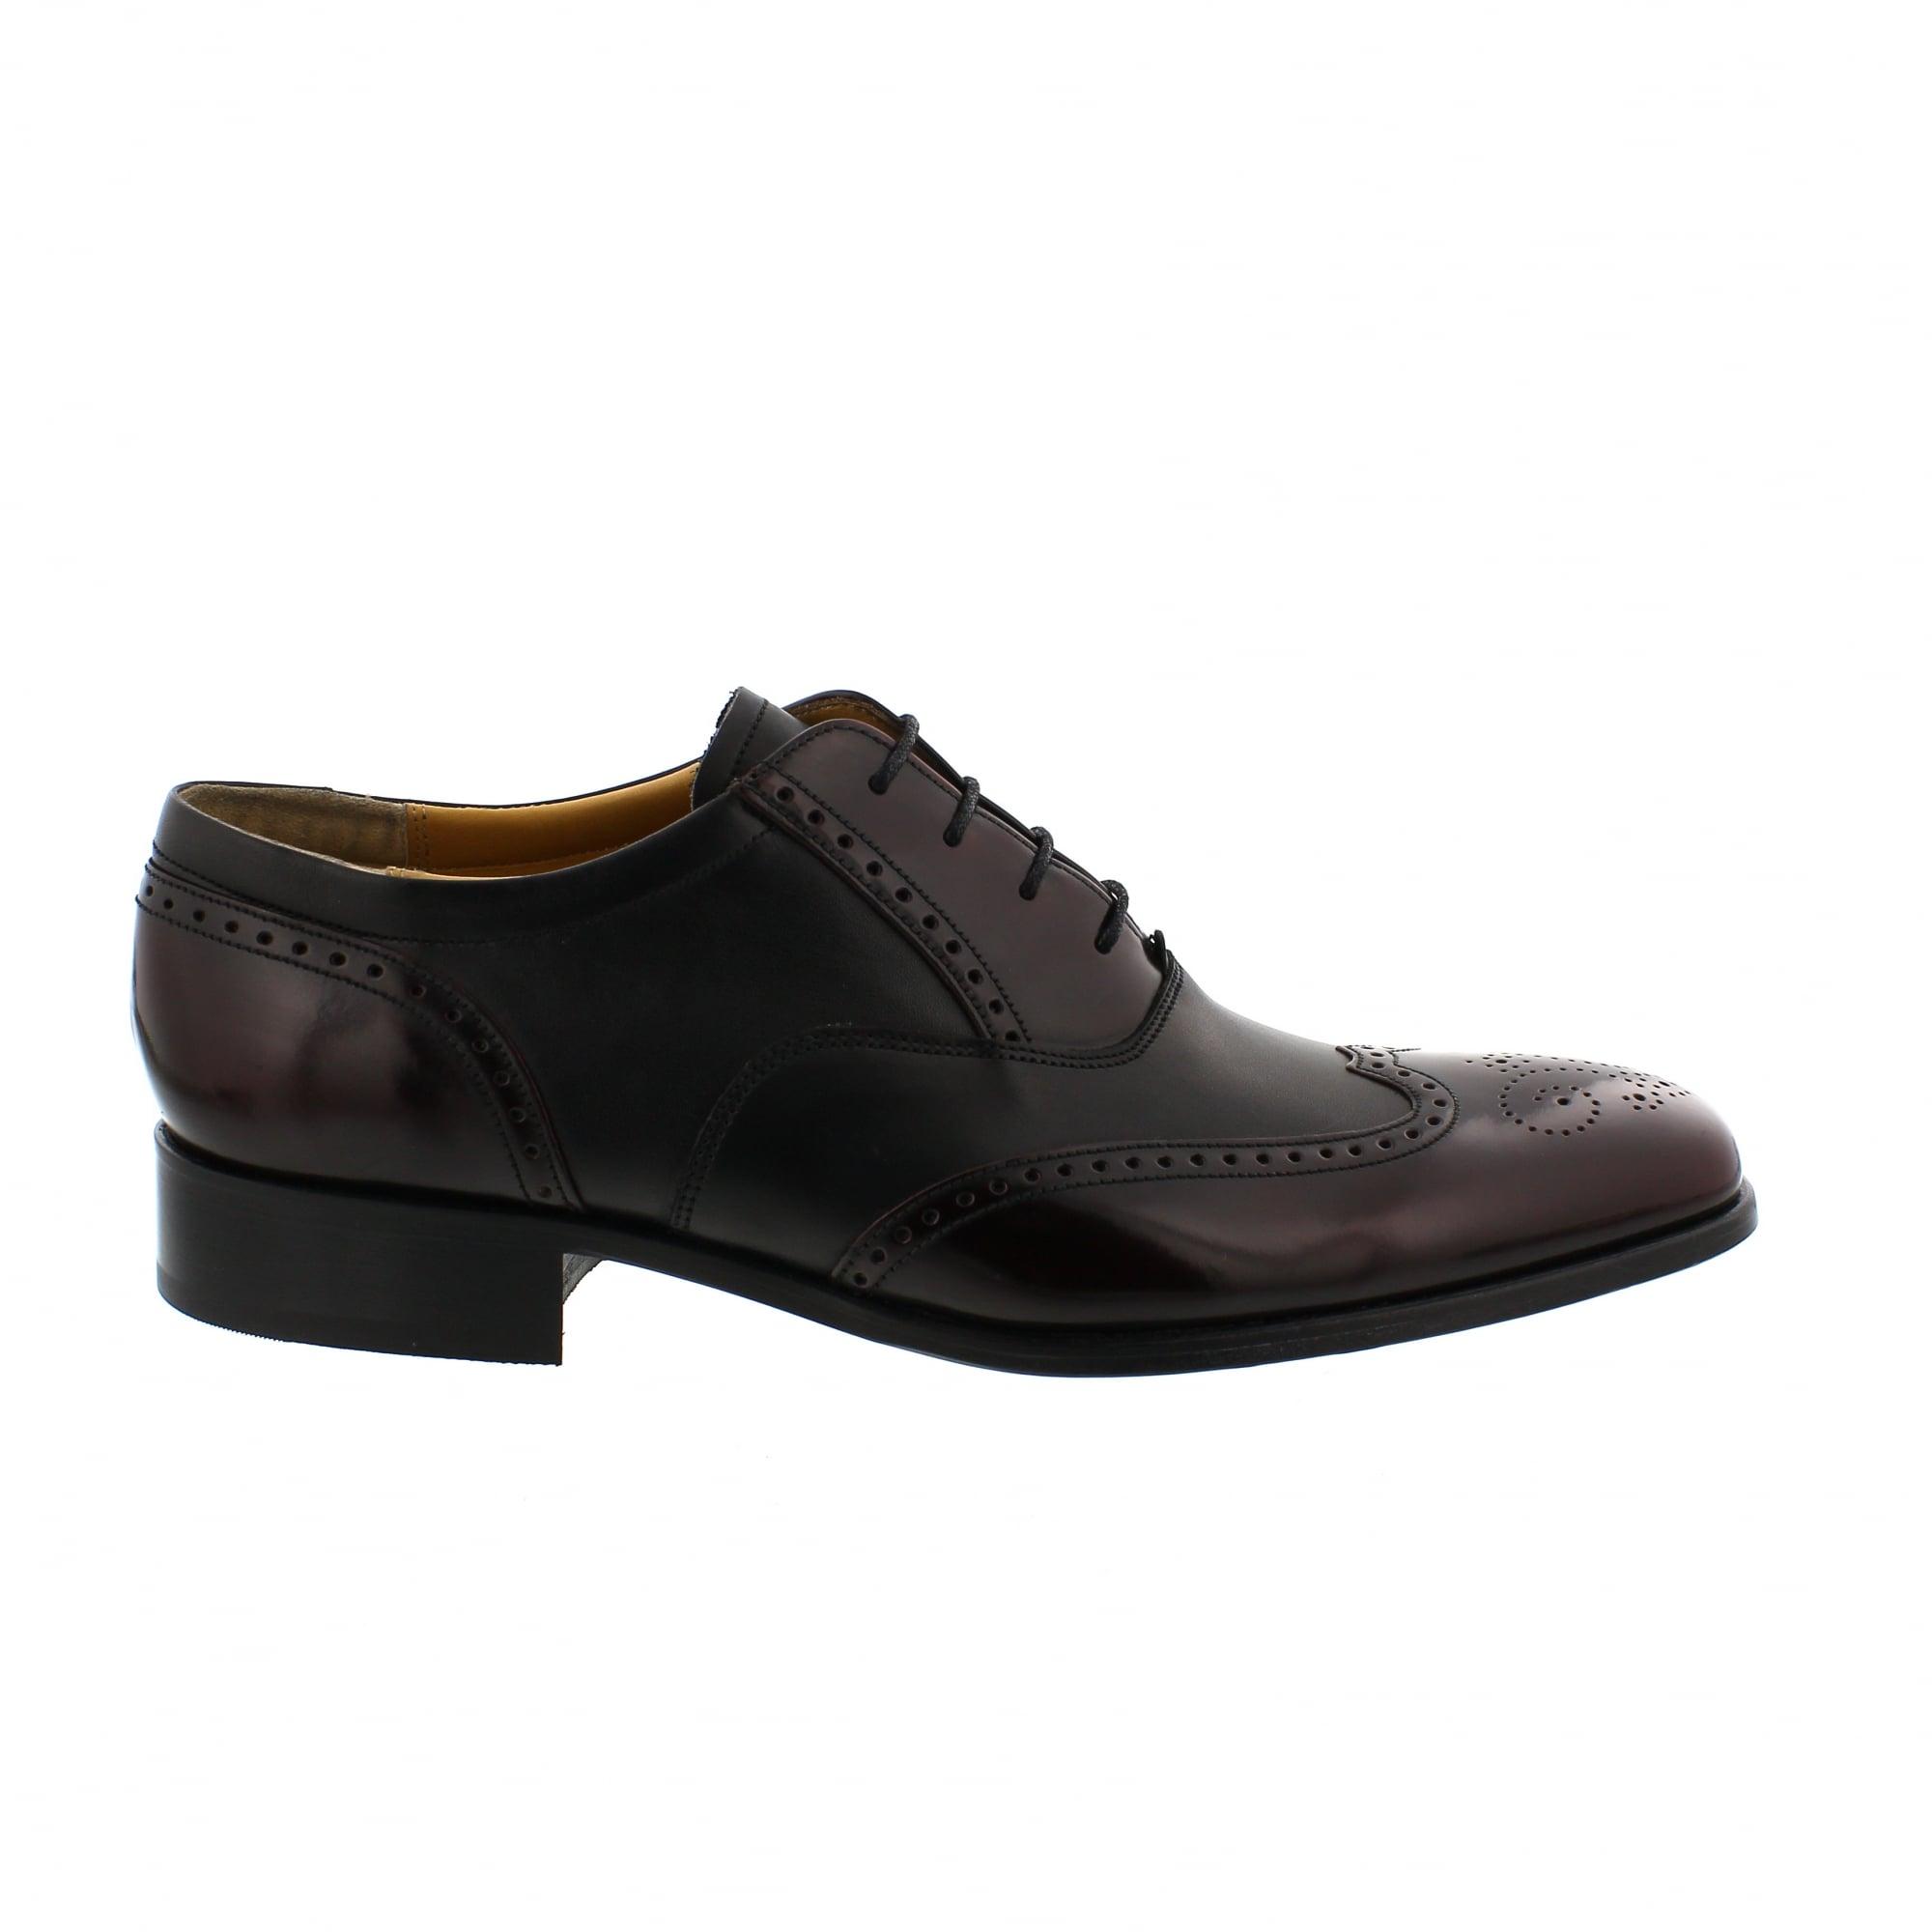 fc9daaaf Barker Dartford F | 132286 - Mens from Rogerson Shoes UK